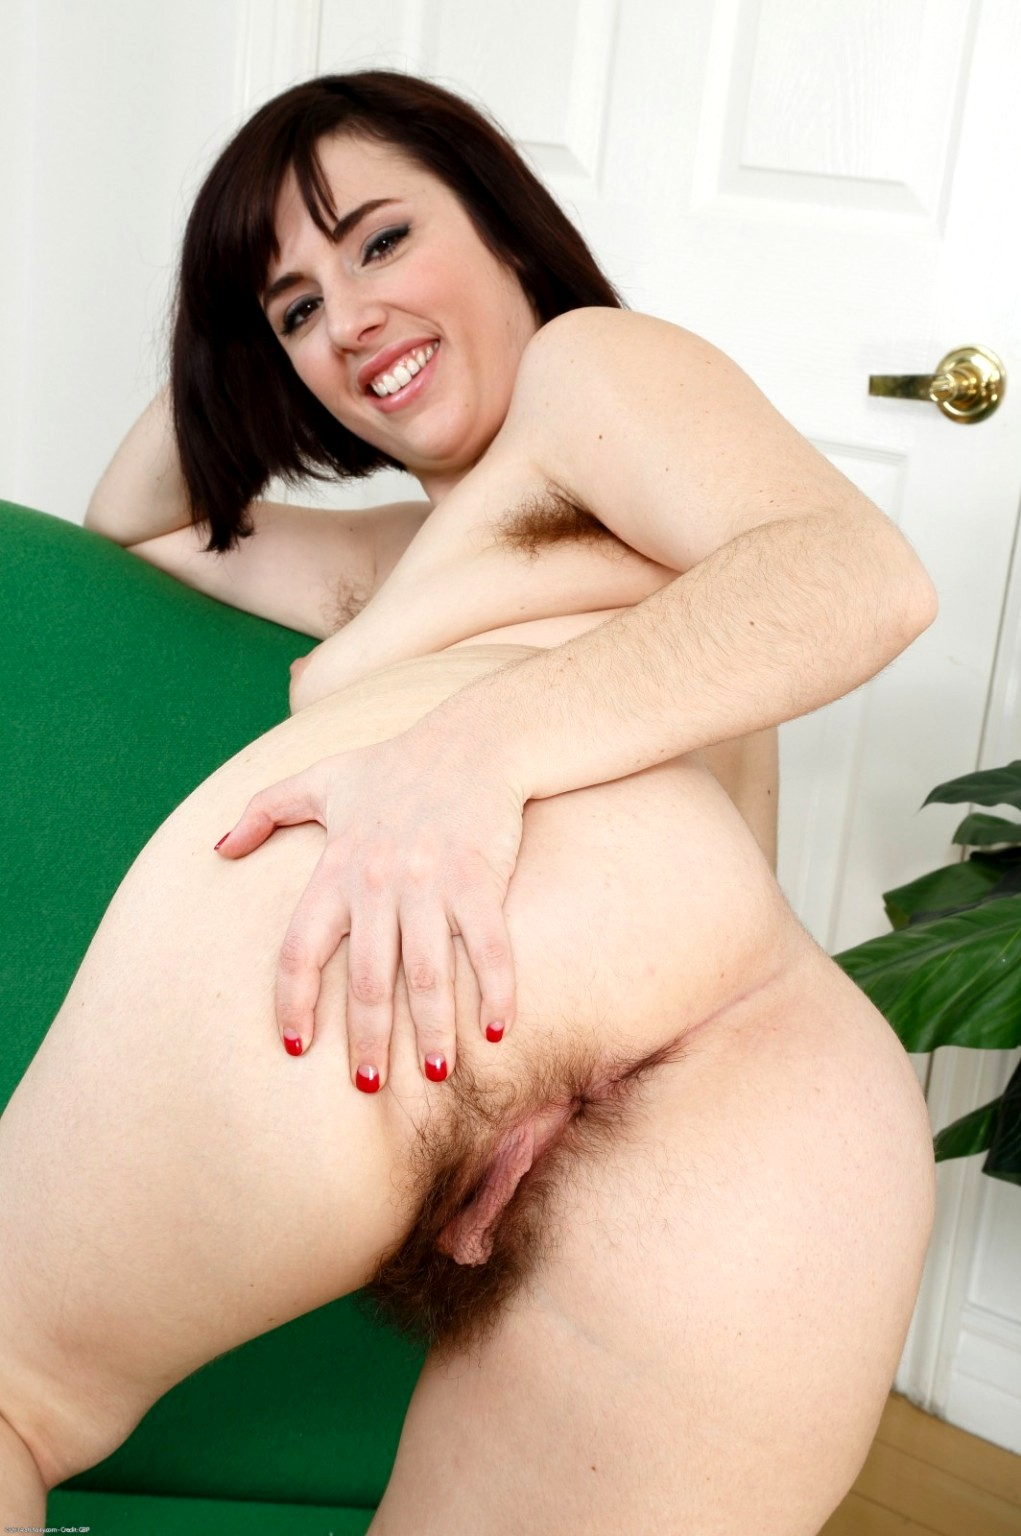 Hairy asshole porn pics